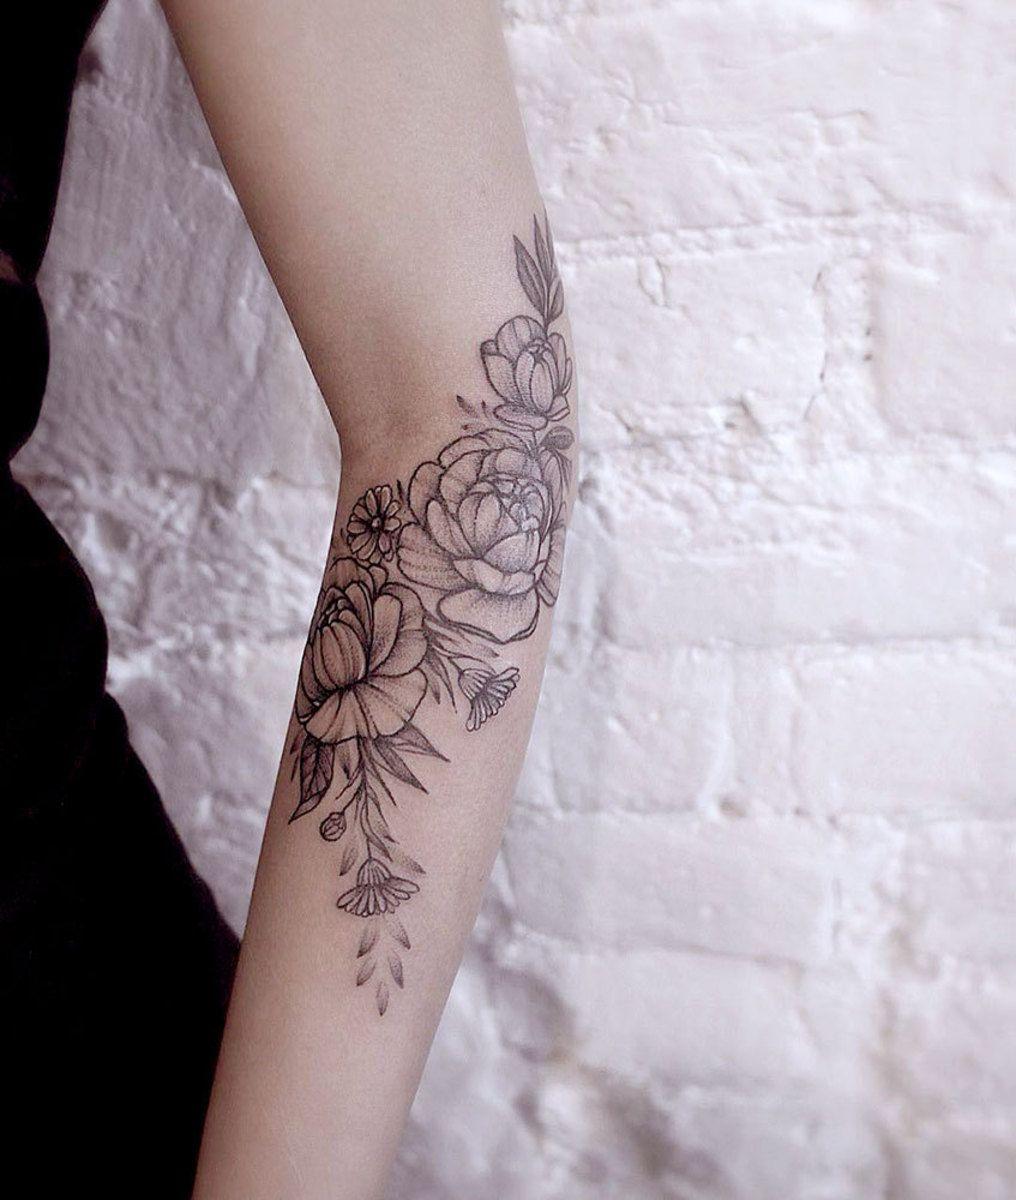 Pin by Sirius Black on Tattoos in 2020 Daffodil tattoo